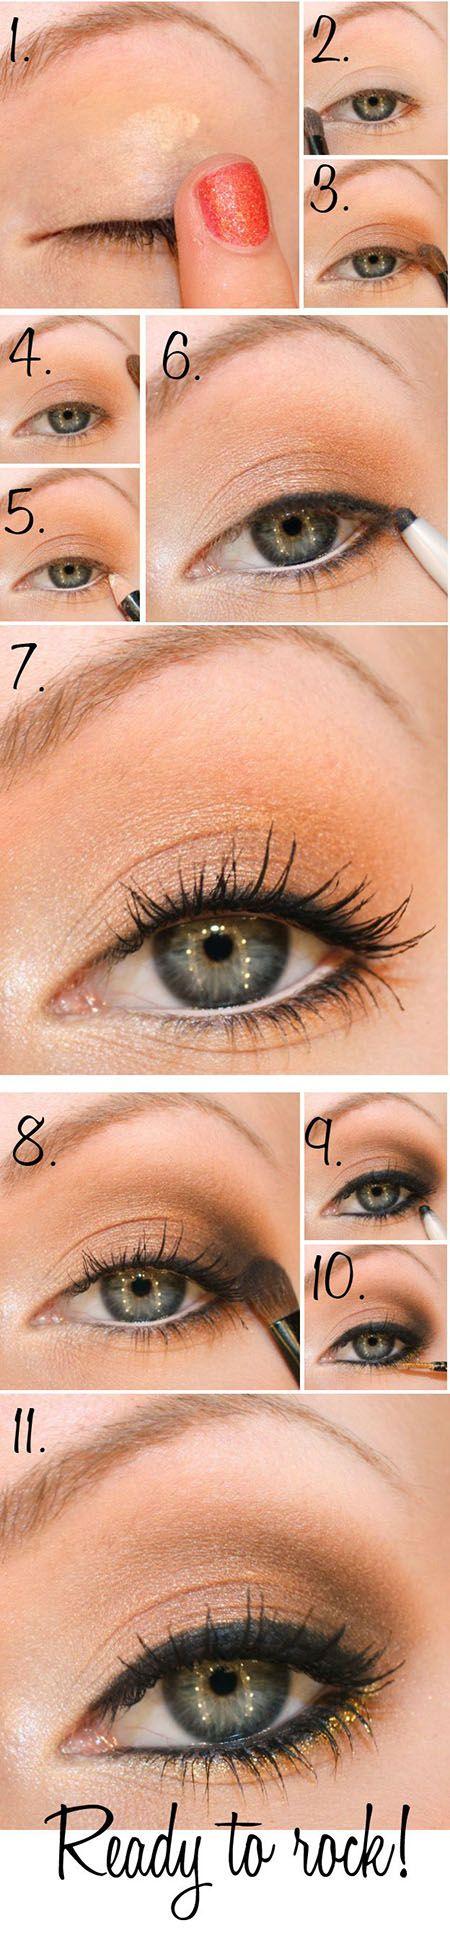 ladies trench coats Eye Makeup   MAKE UP      Eye Makeup  Eye and Makeup